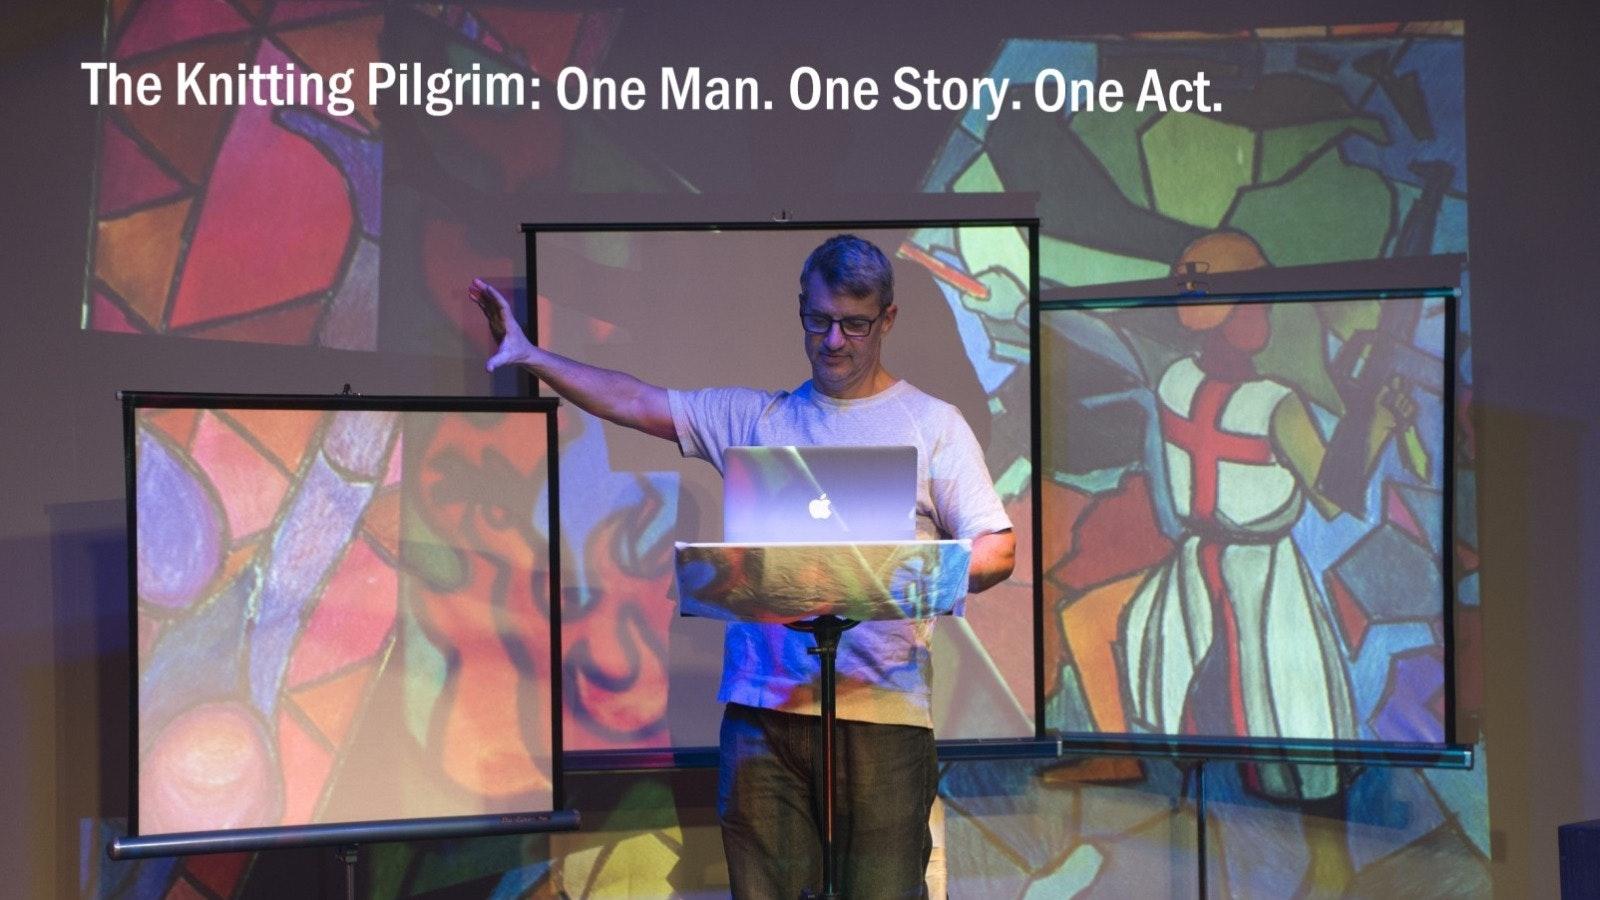 The Knitting Pilgrim